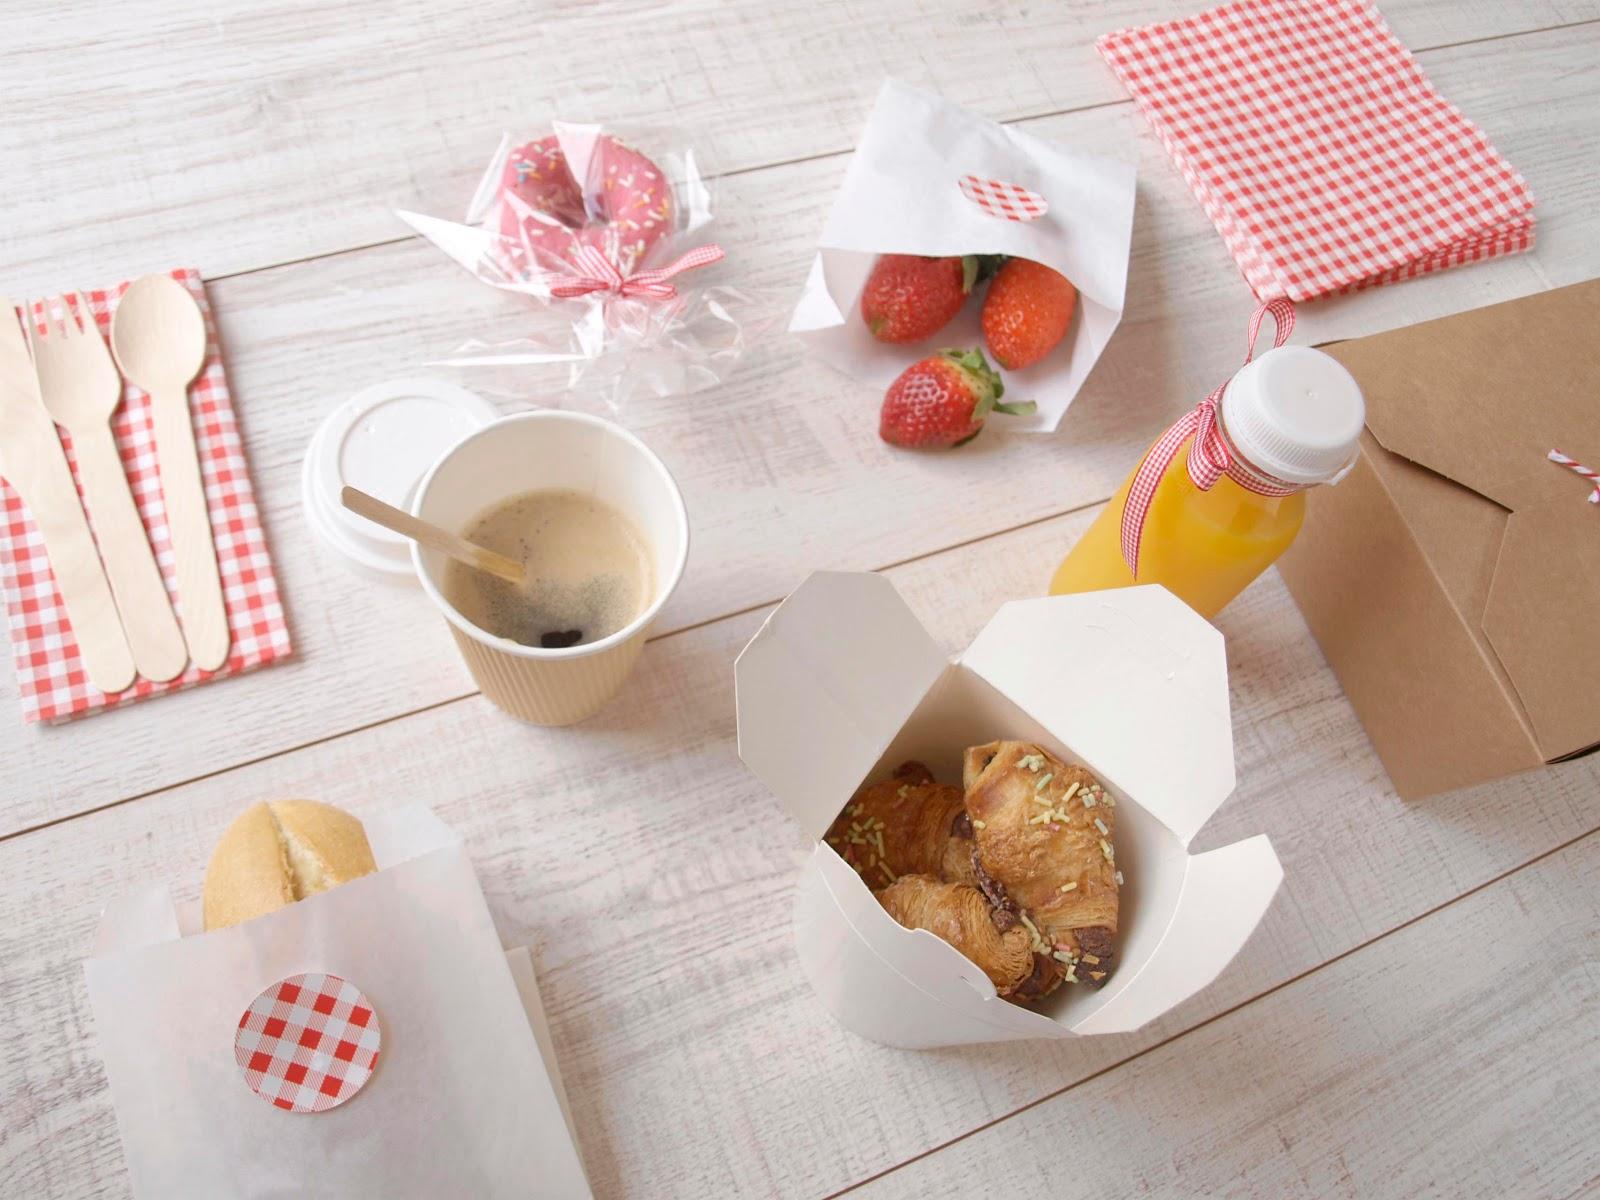 Kit de desayuno blog cocott - Preparar desayuno romantico ...